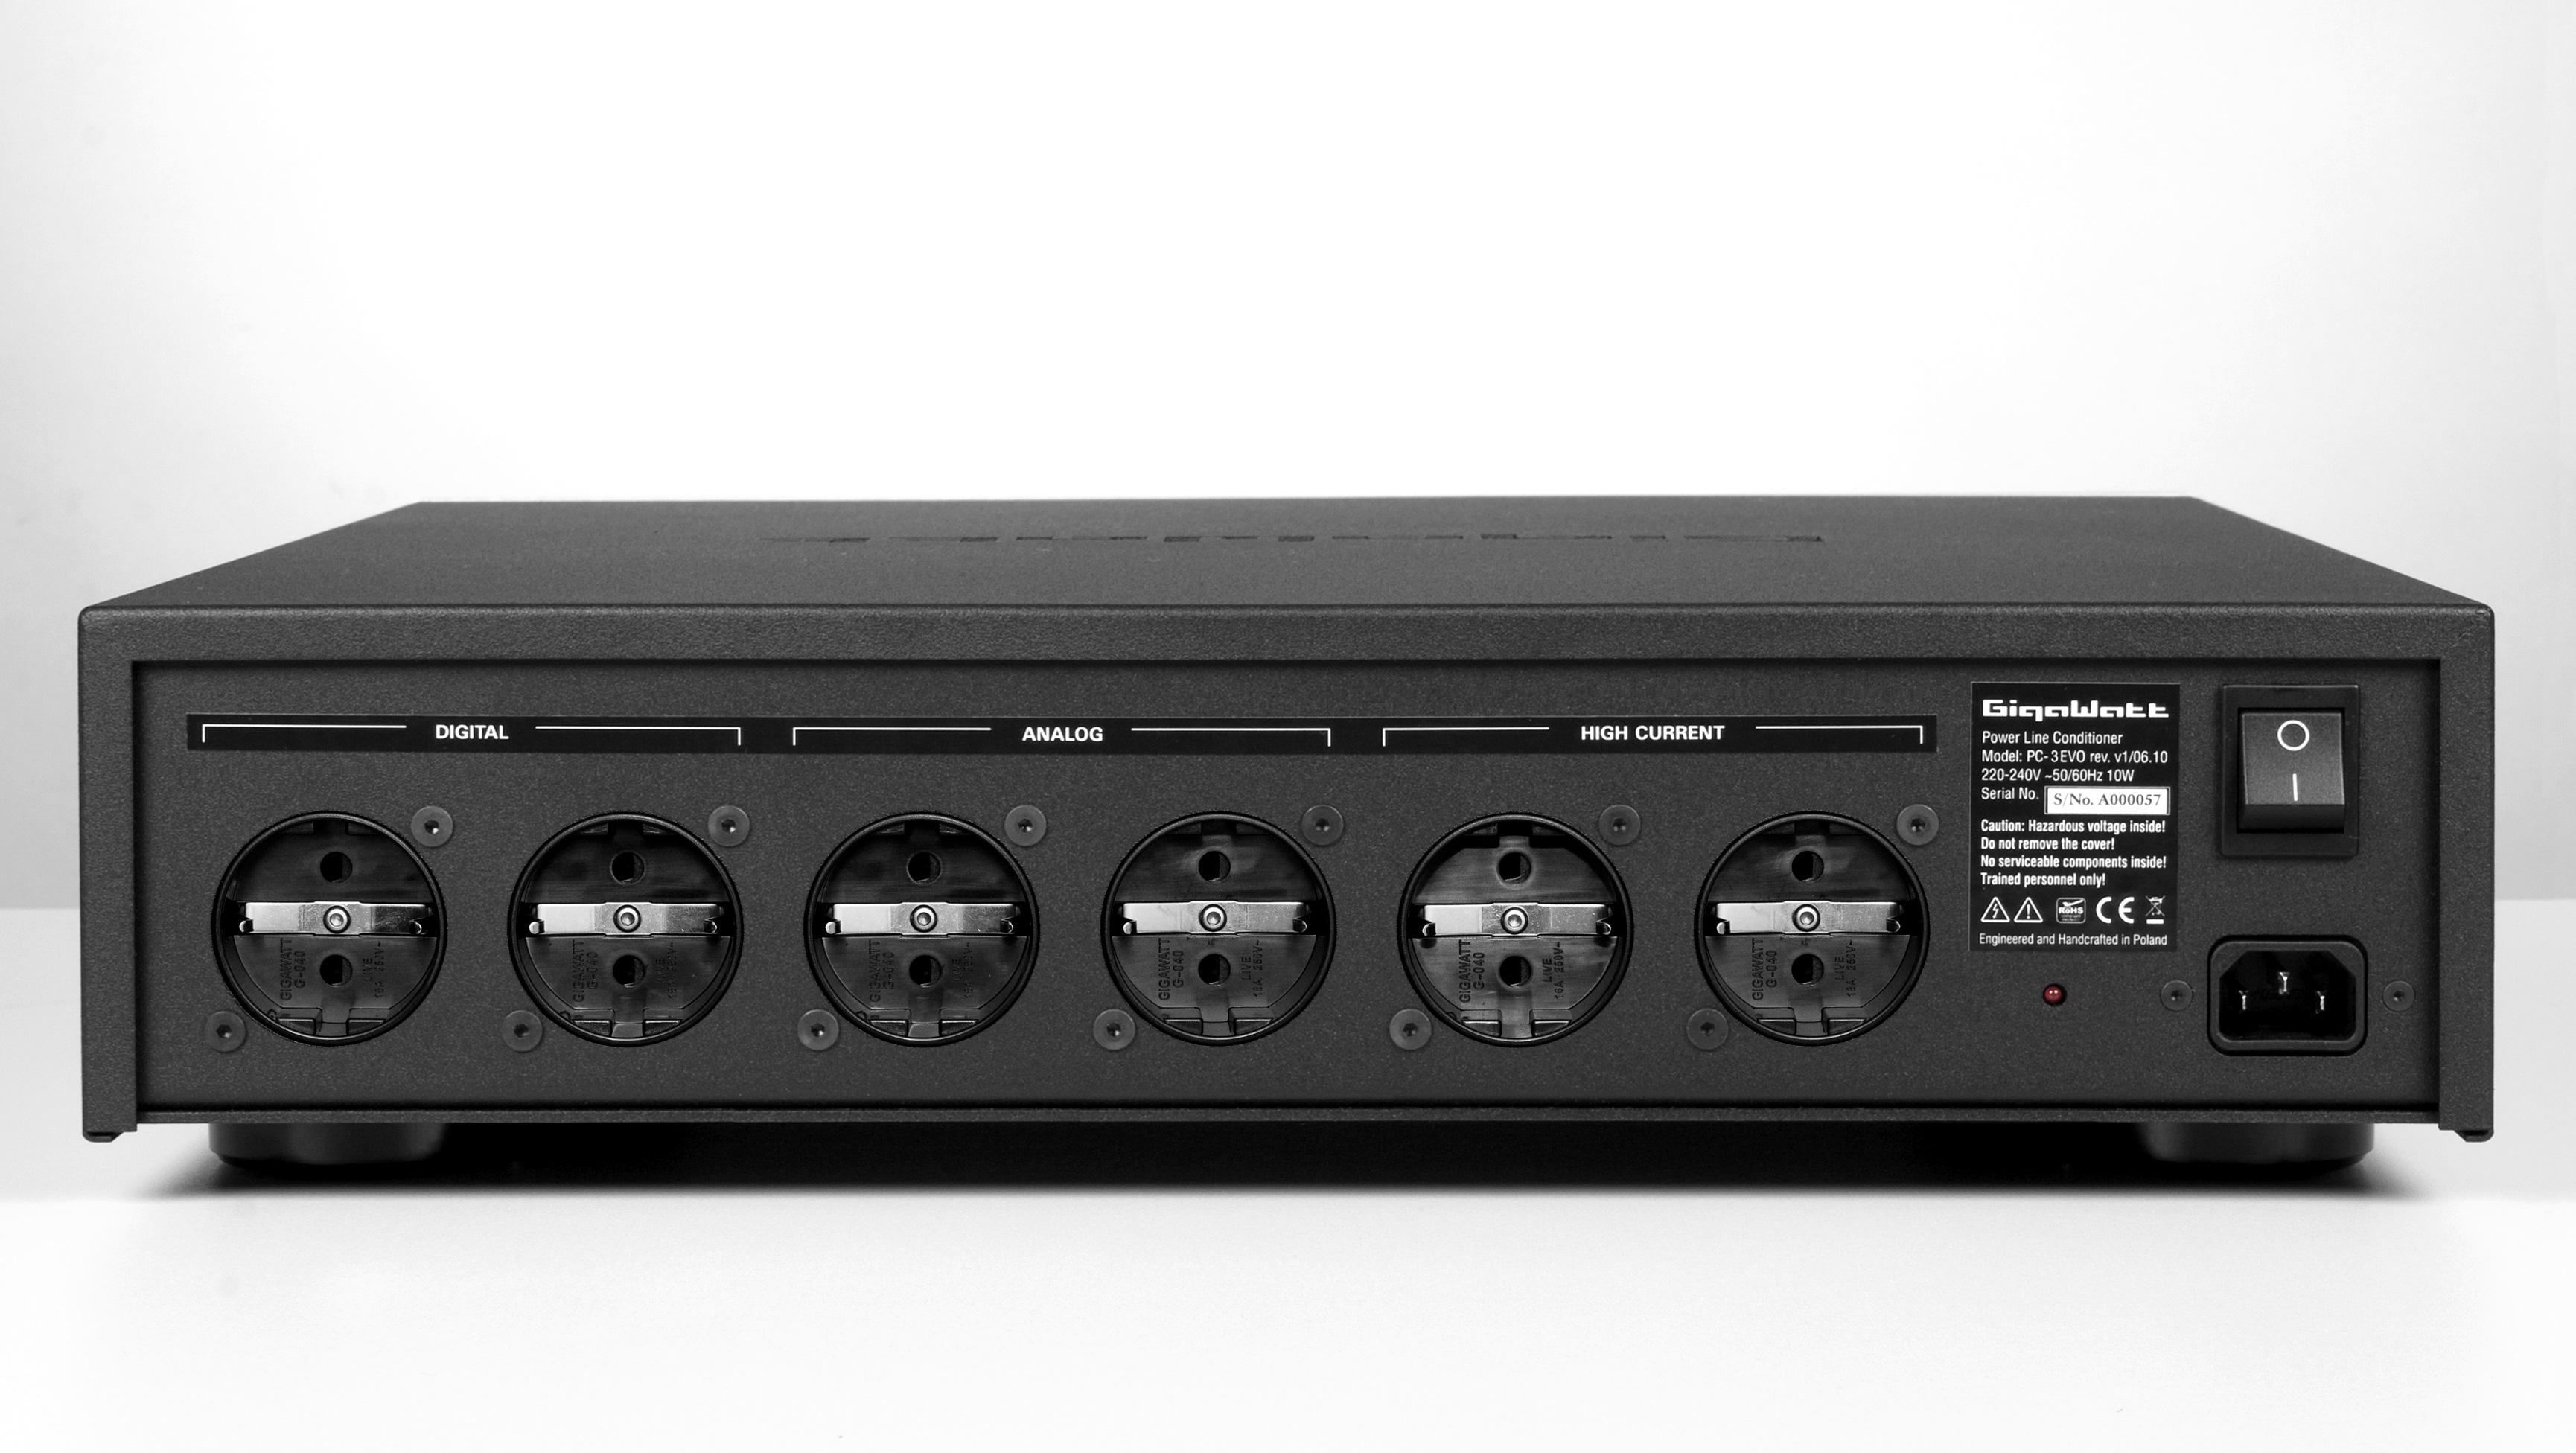 GigaWatt Power Line Conditioner GigaWatt PC-3 EVO+ True Audiophile.